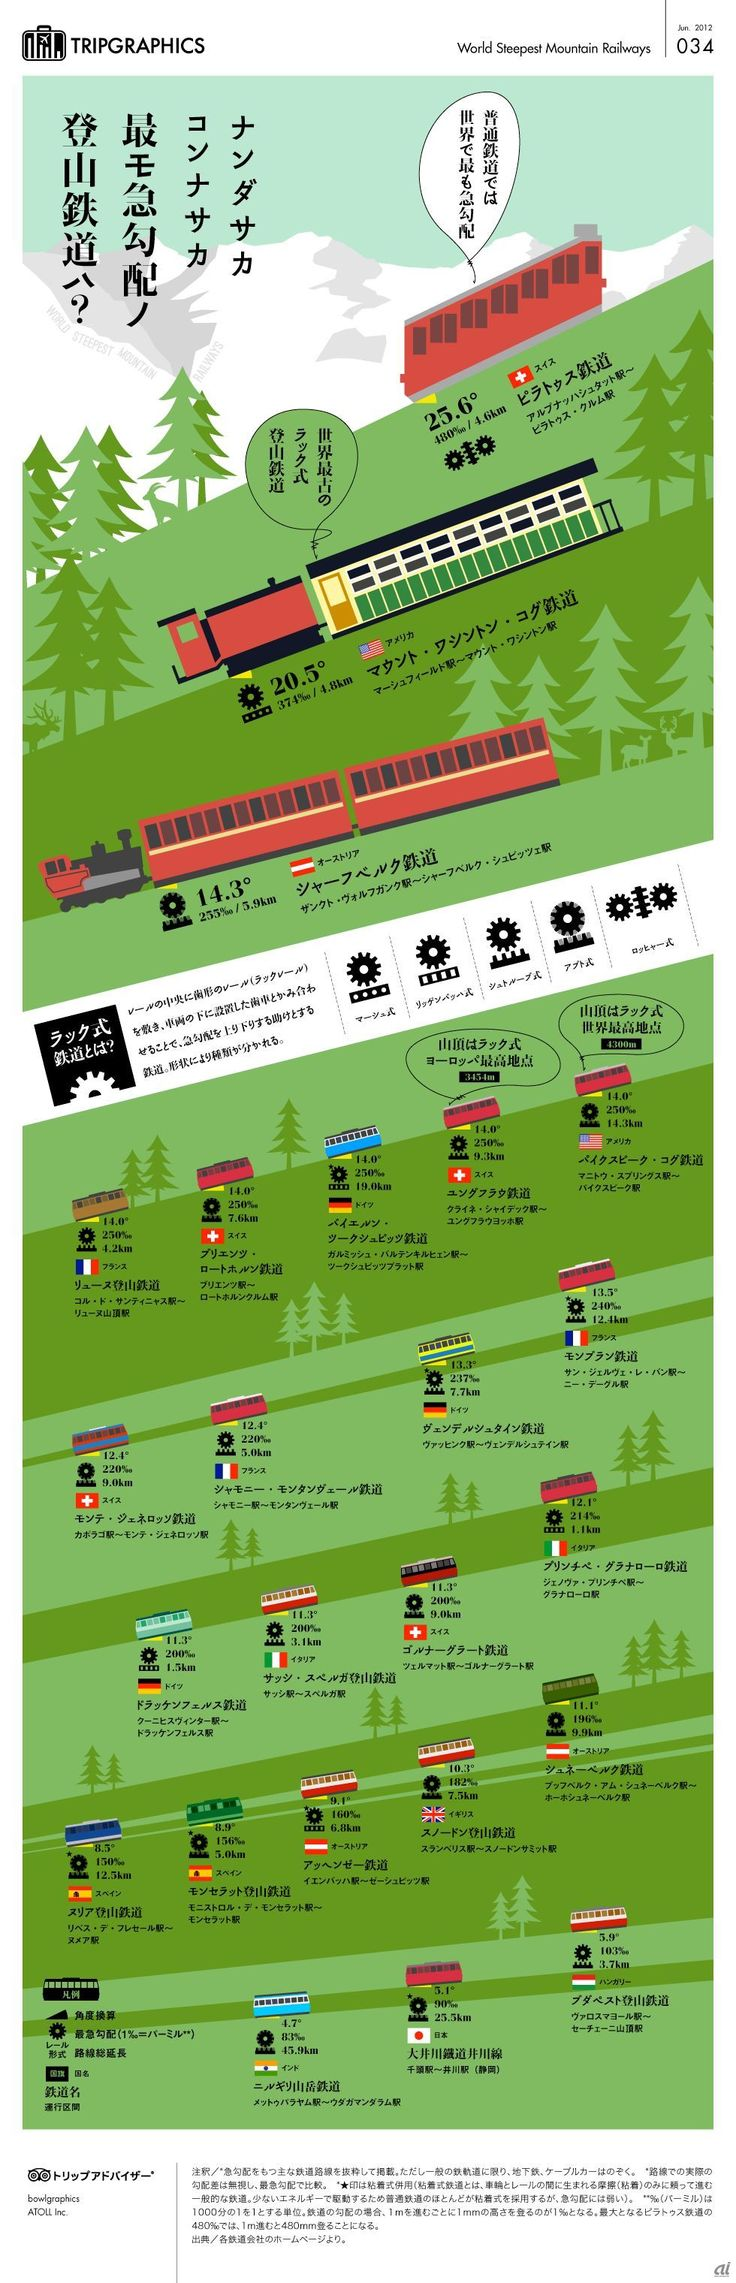 Mountain Railway in the world.